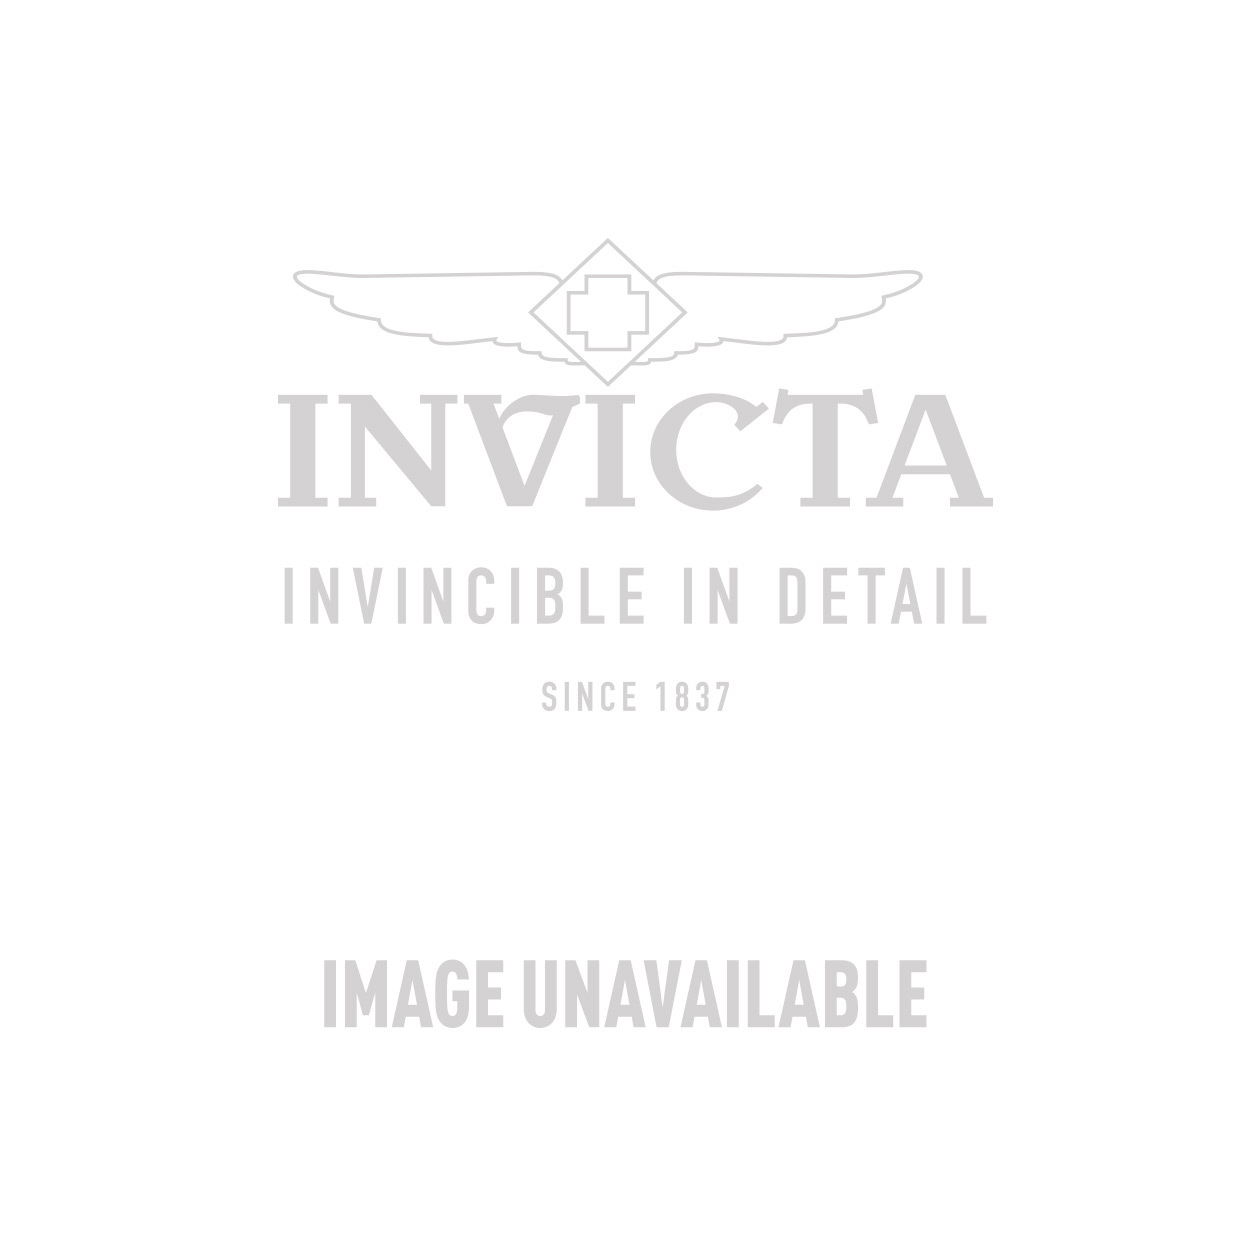 Invicta Venom  Quartz Watch - Stainless Steel case with Black tone Stainless Steel, Polyurethane band - Model F0004